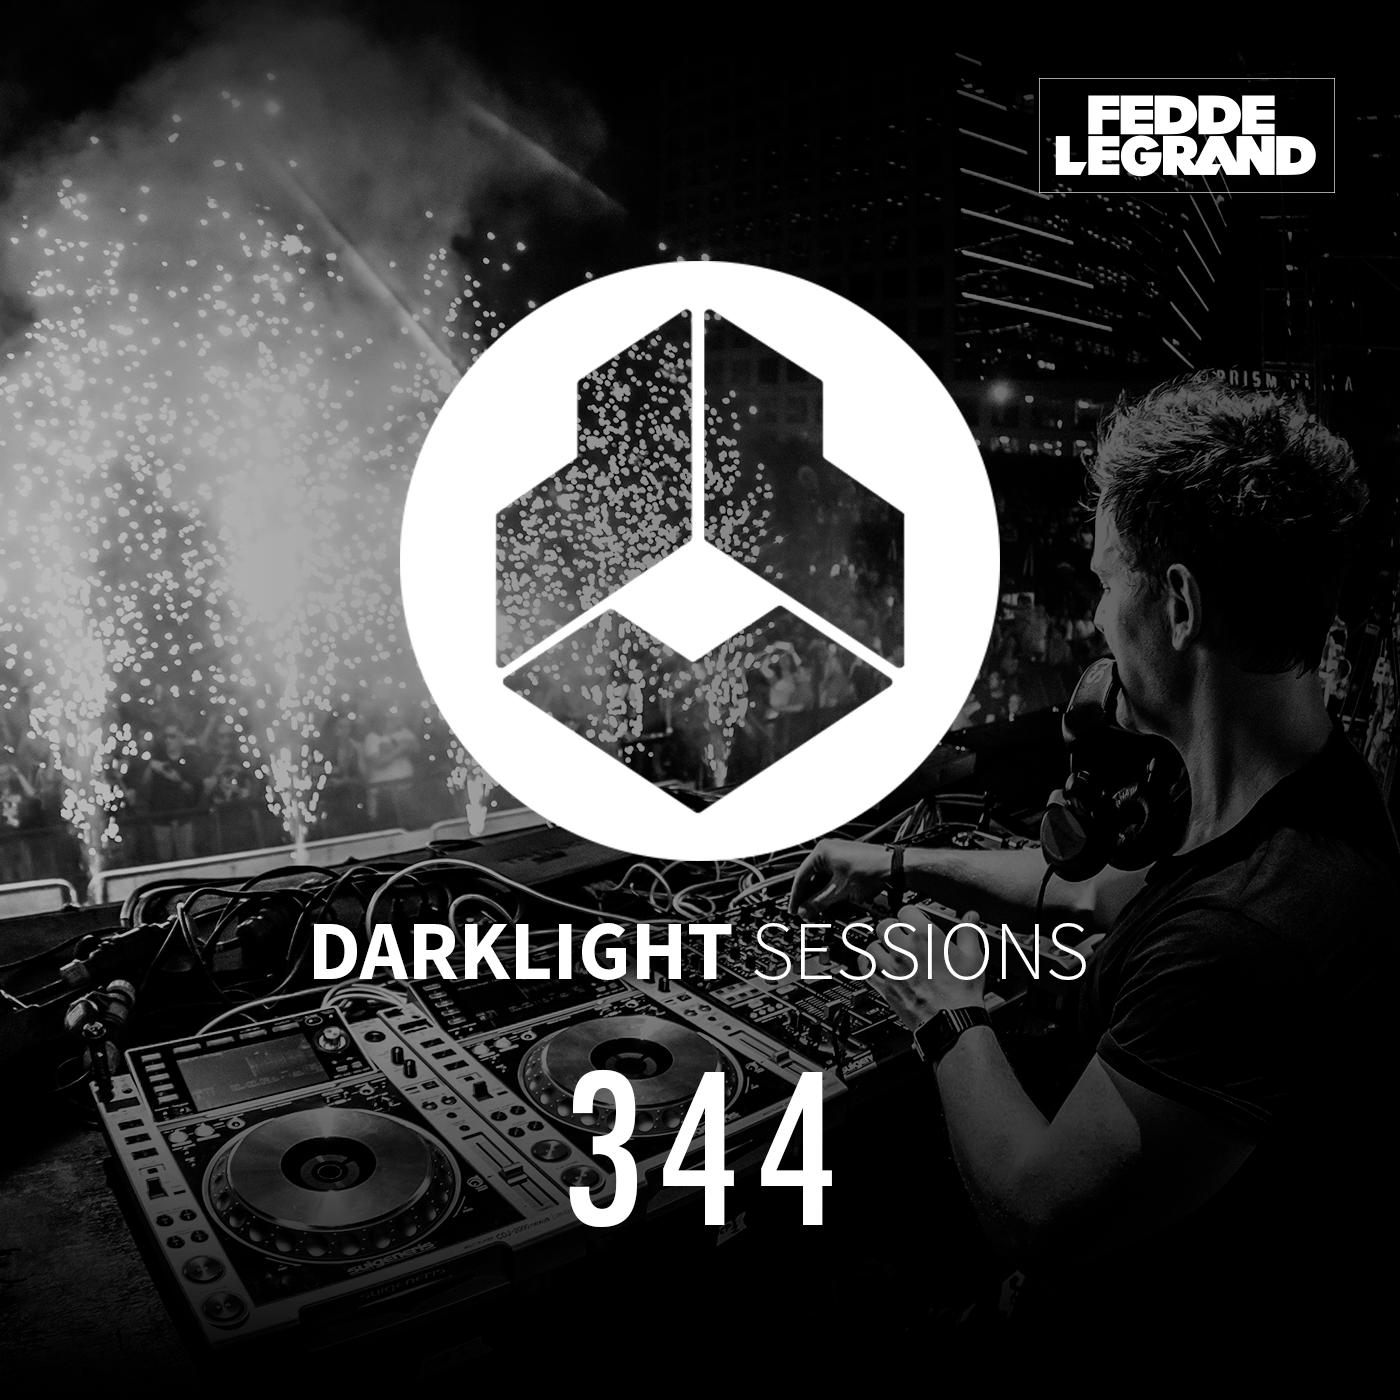 Darklight Sessions 344